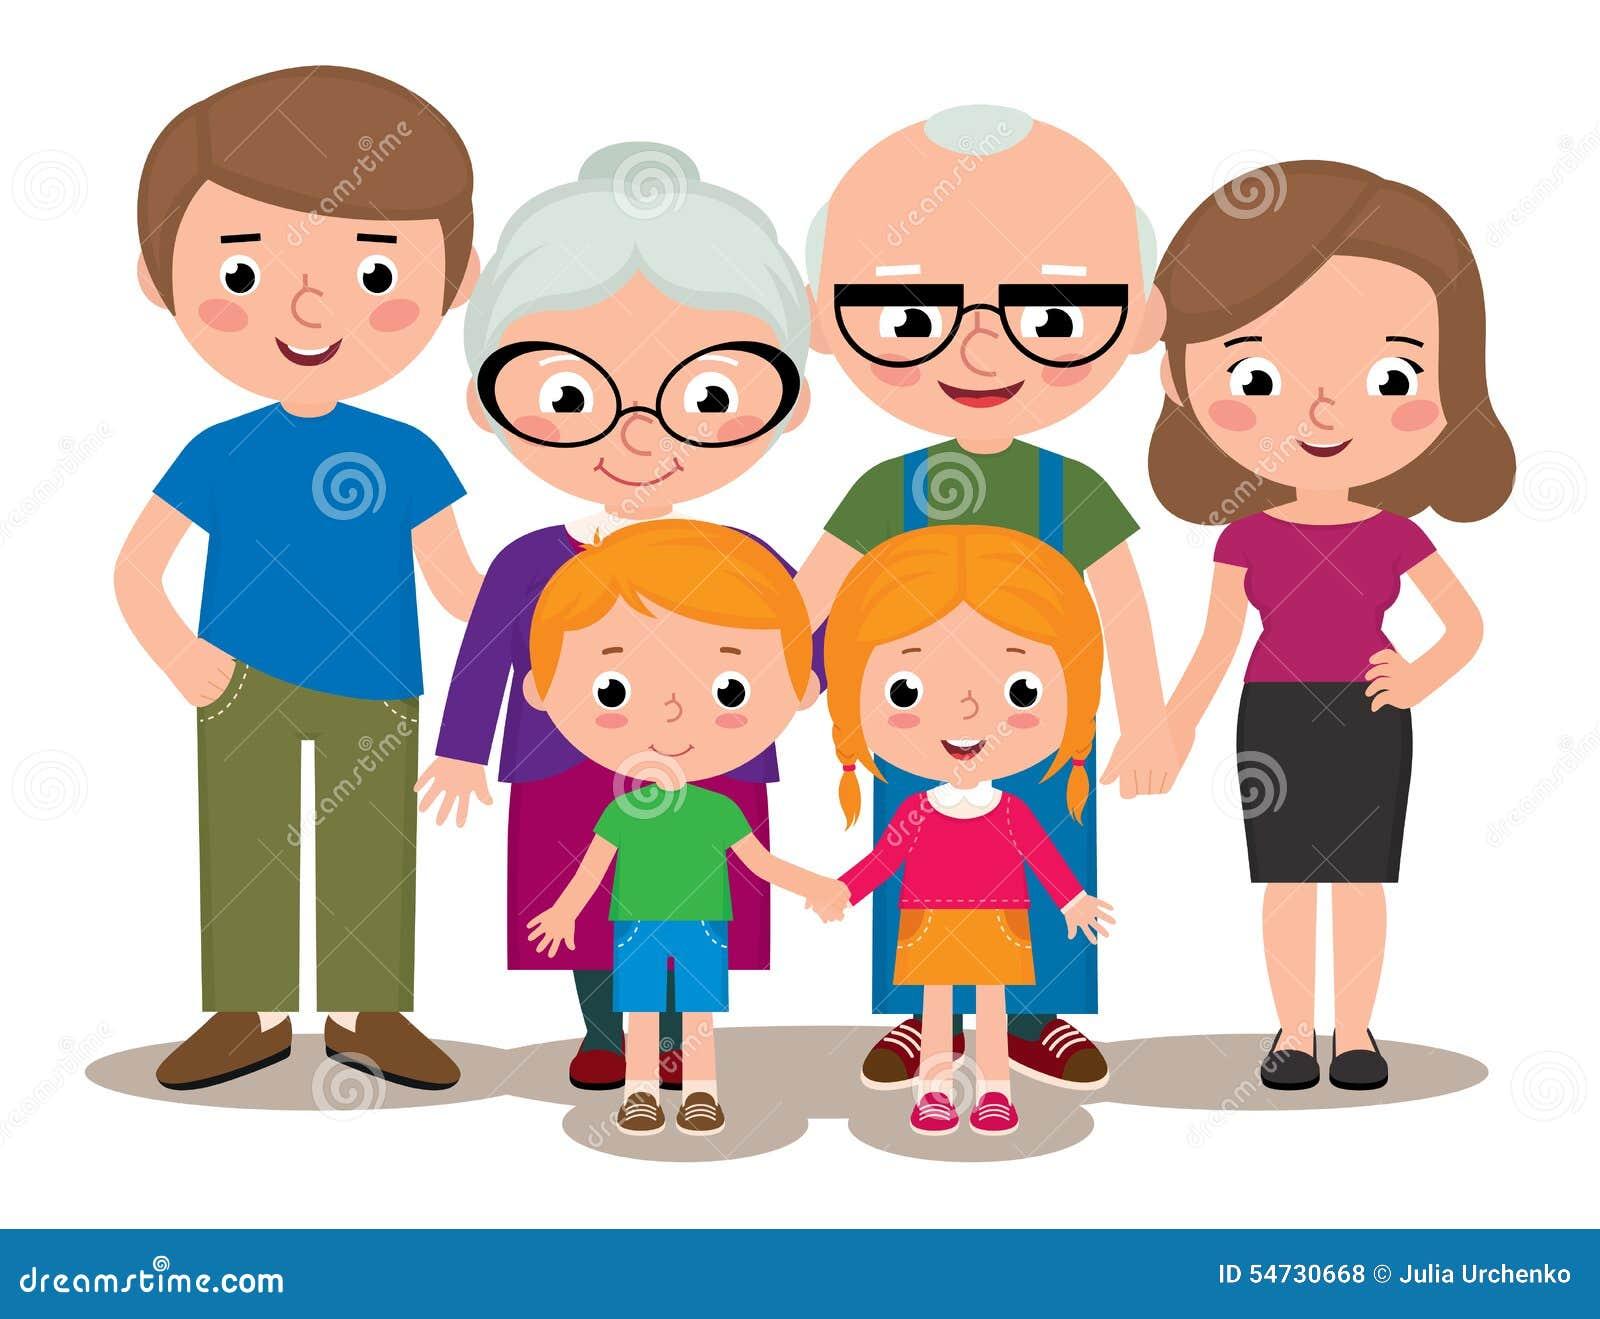 Family Group Portrait Parents Grandparents And Children Stock Vector